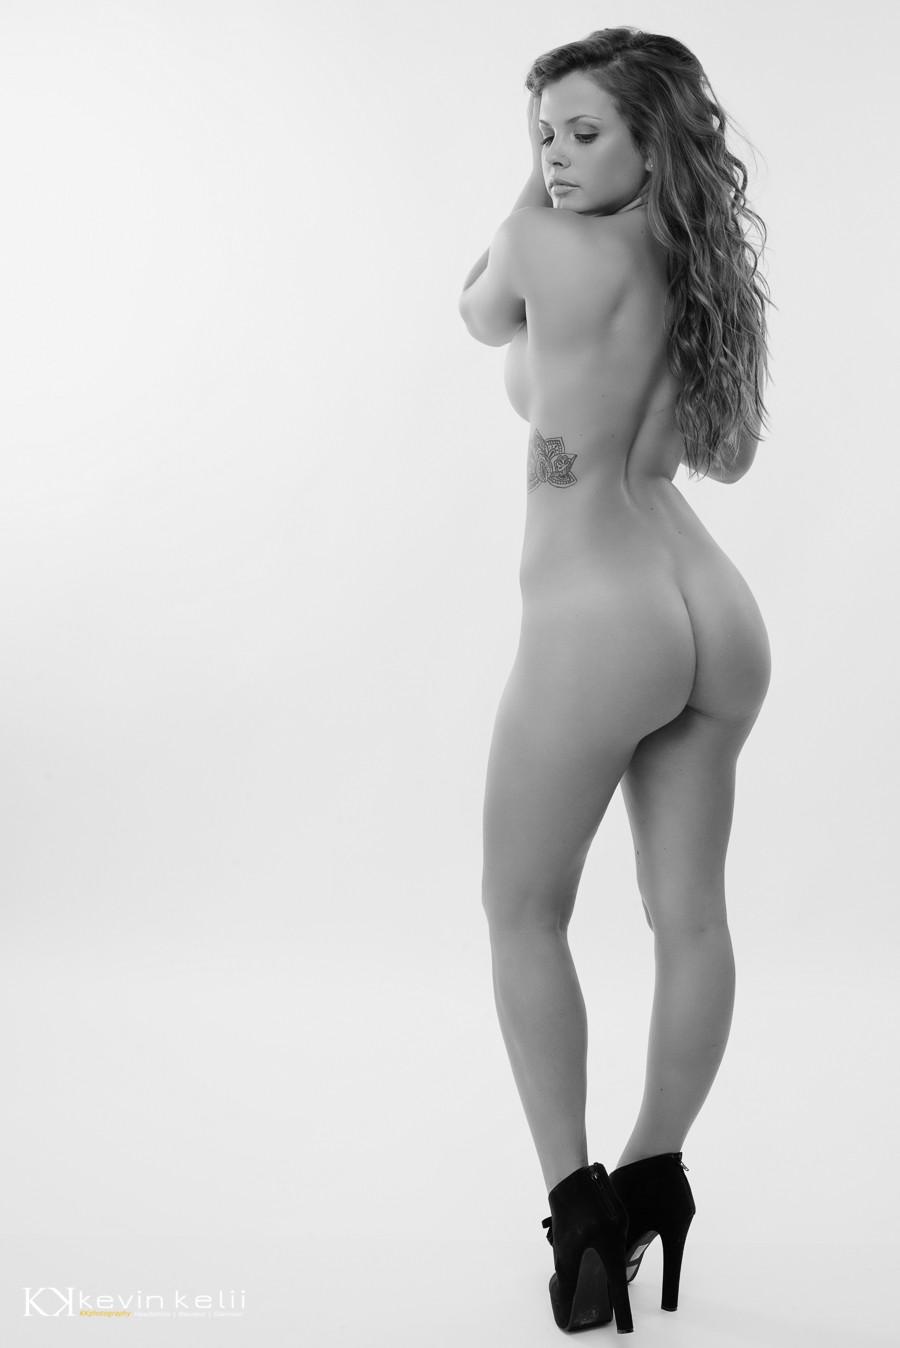 Classy Nude Photography  shoot-003.jpg